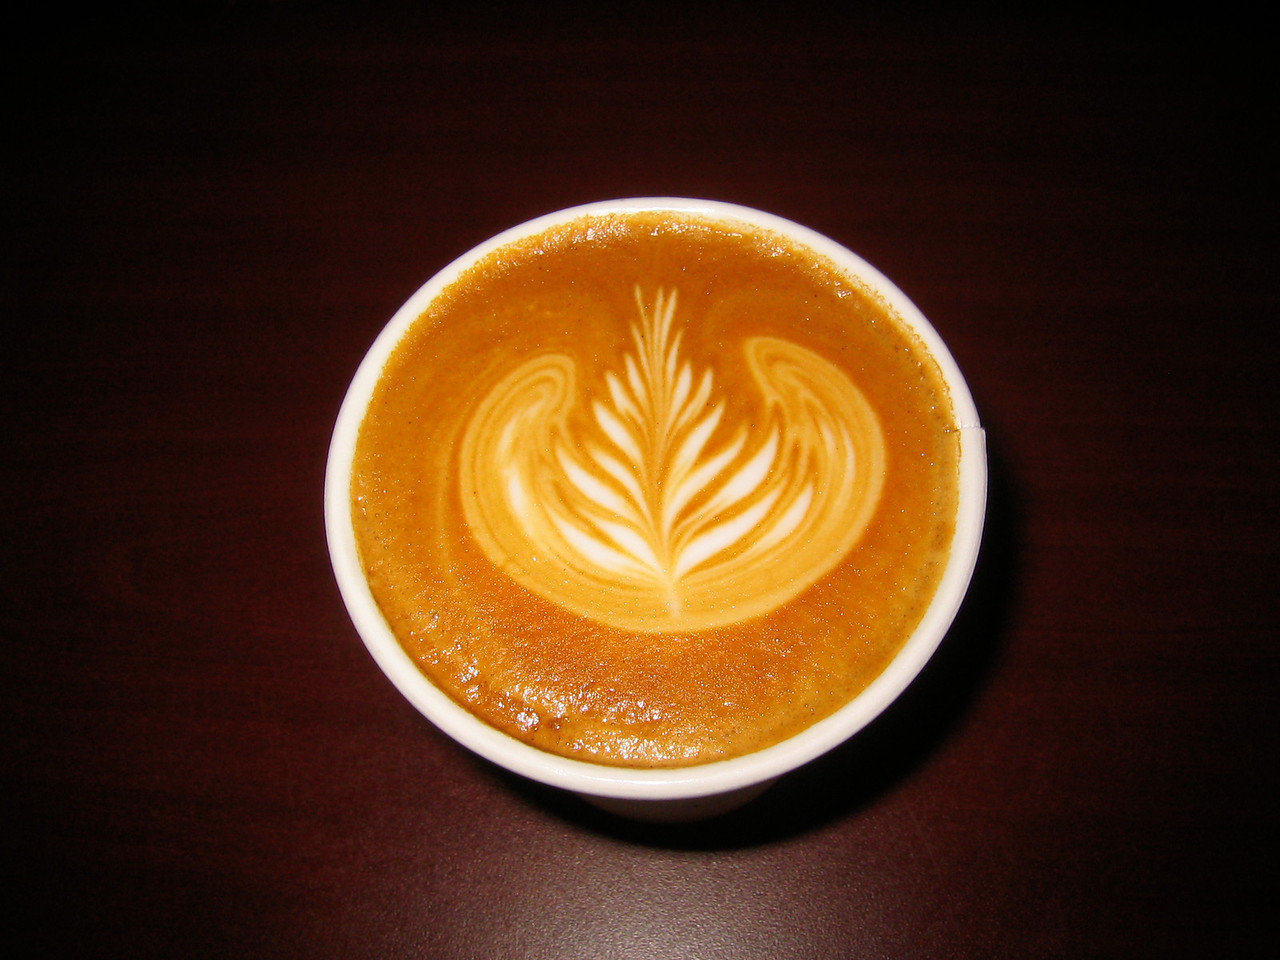 2005 05 25 Wed - Artsy Fartsy milk in coffee